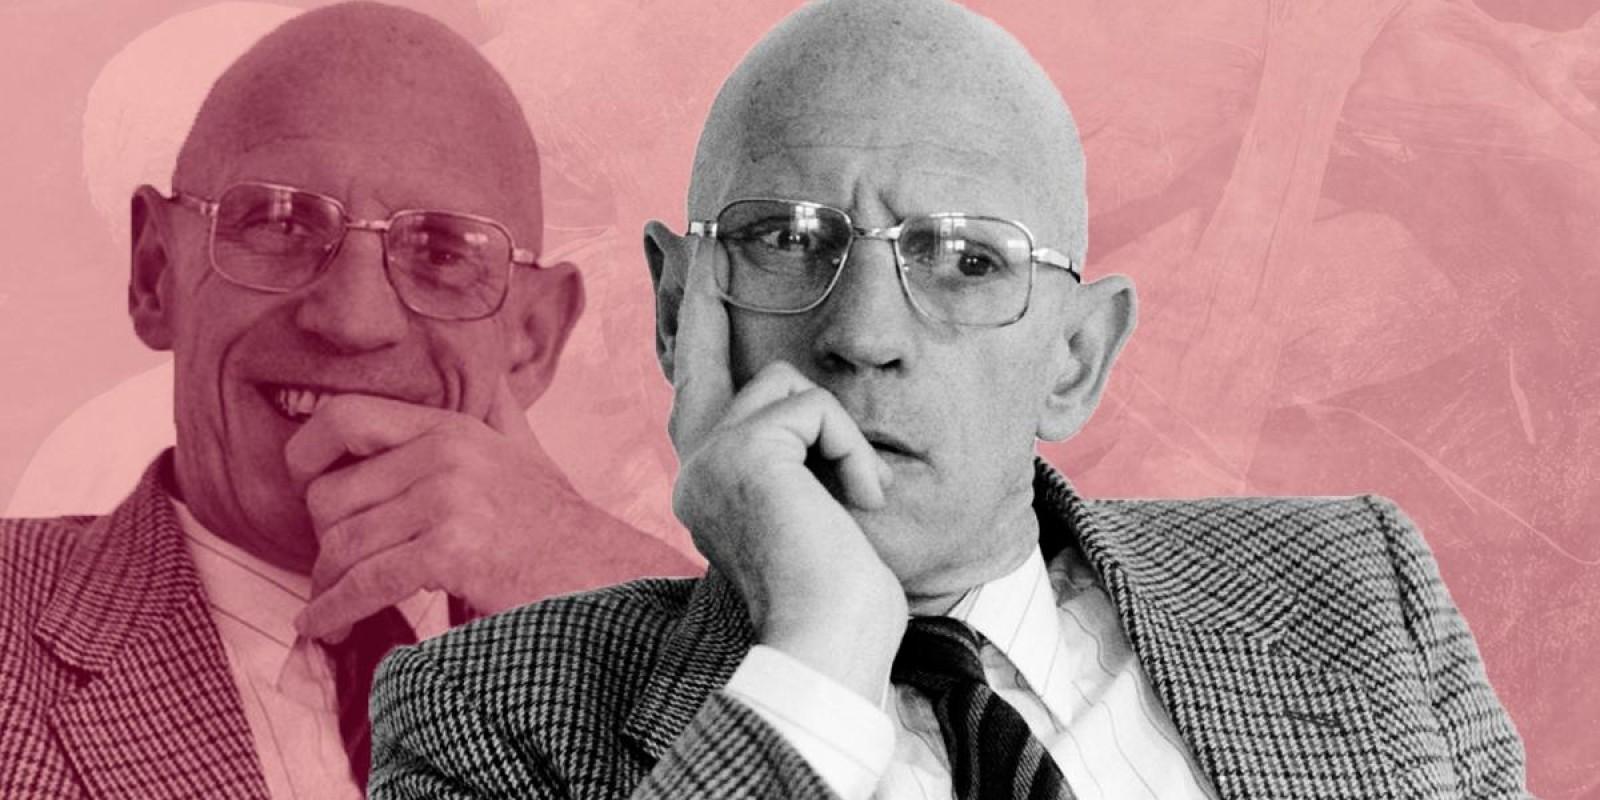 Conheça Michel Foucault